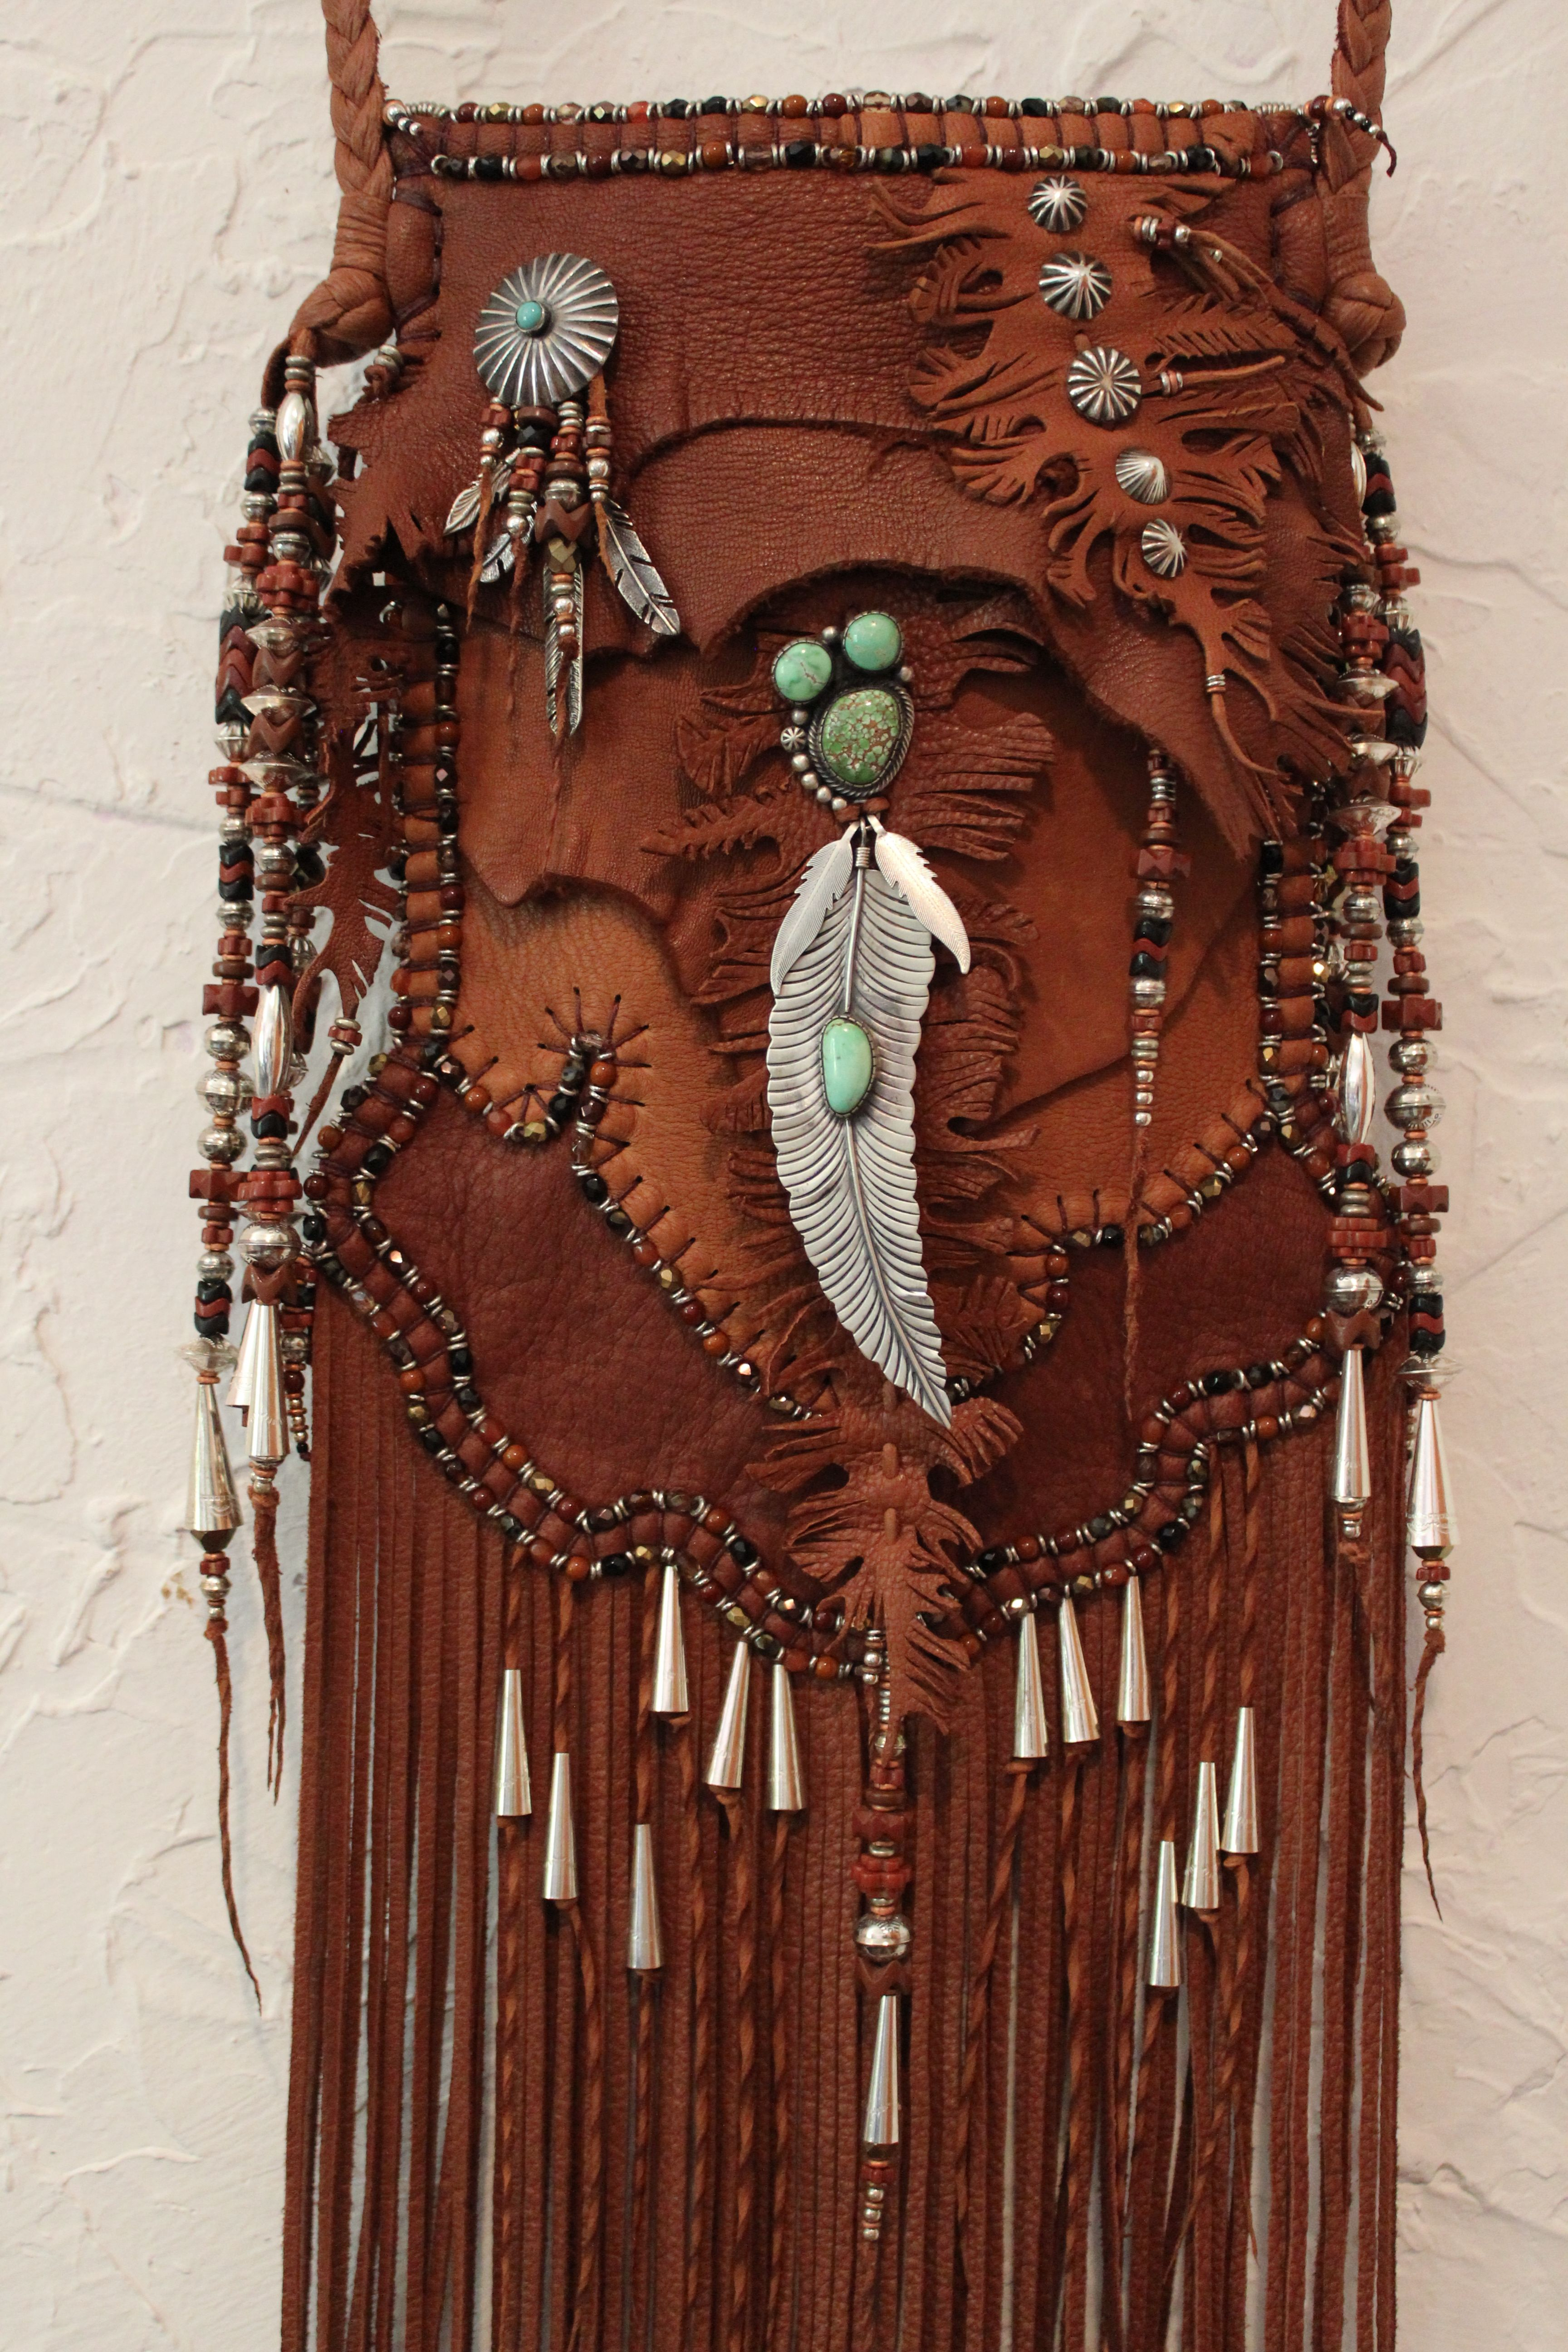 ॐ American Hippie Bohemian Style Boho Leather Fringe Bag